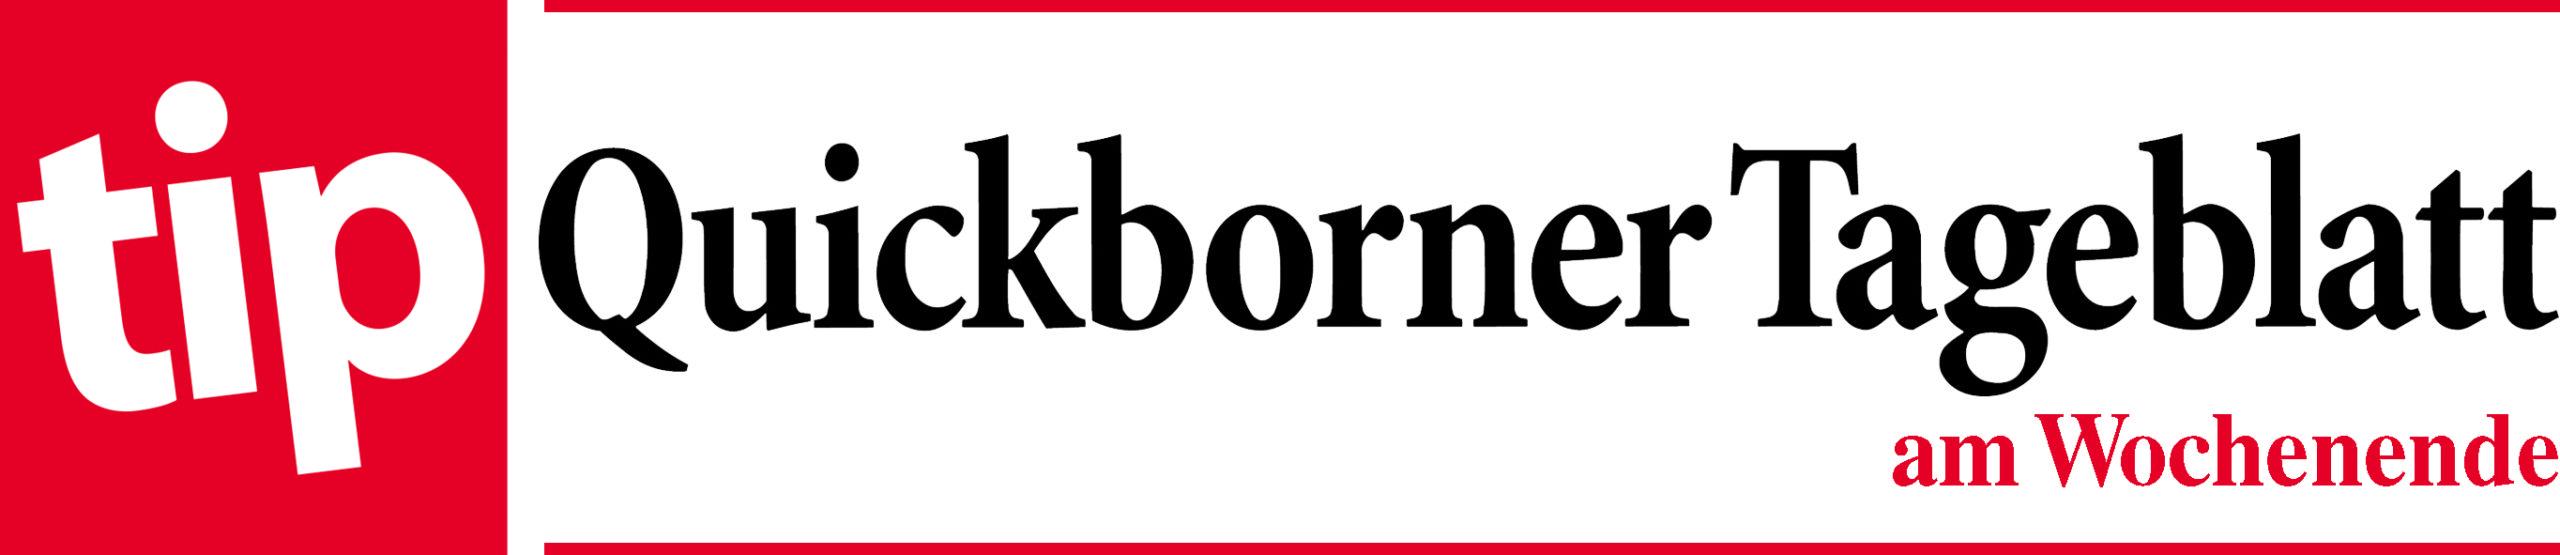 tip_Quickborner_Tageblatt_5sp